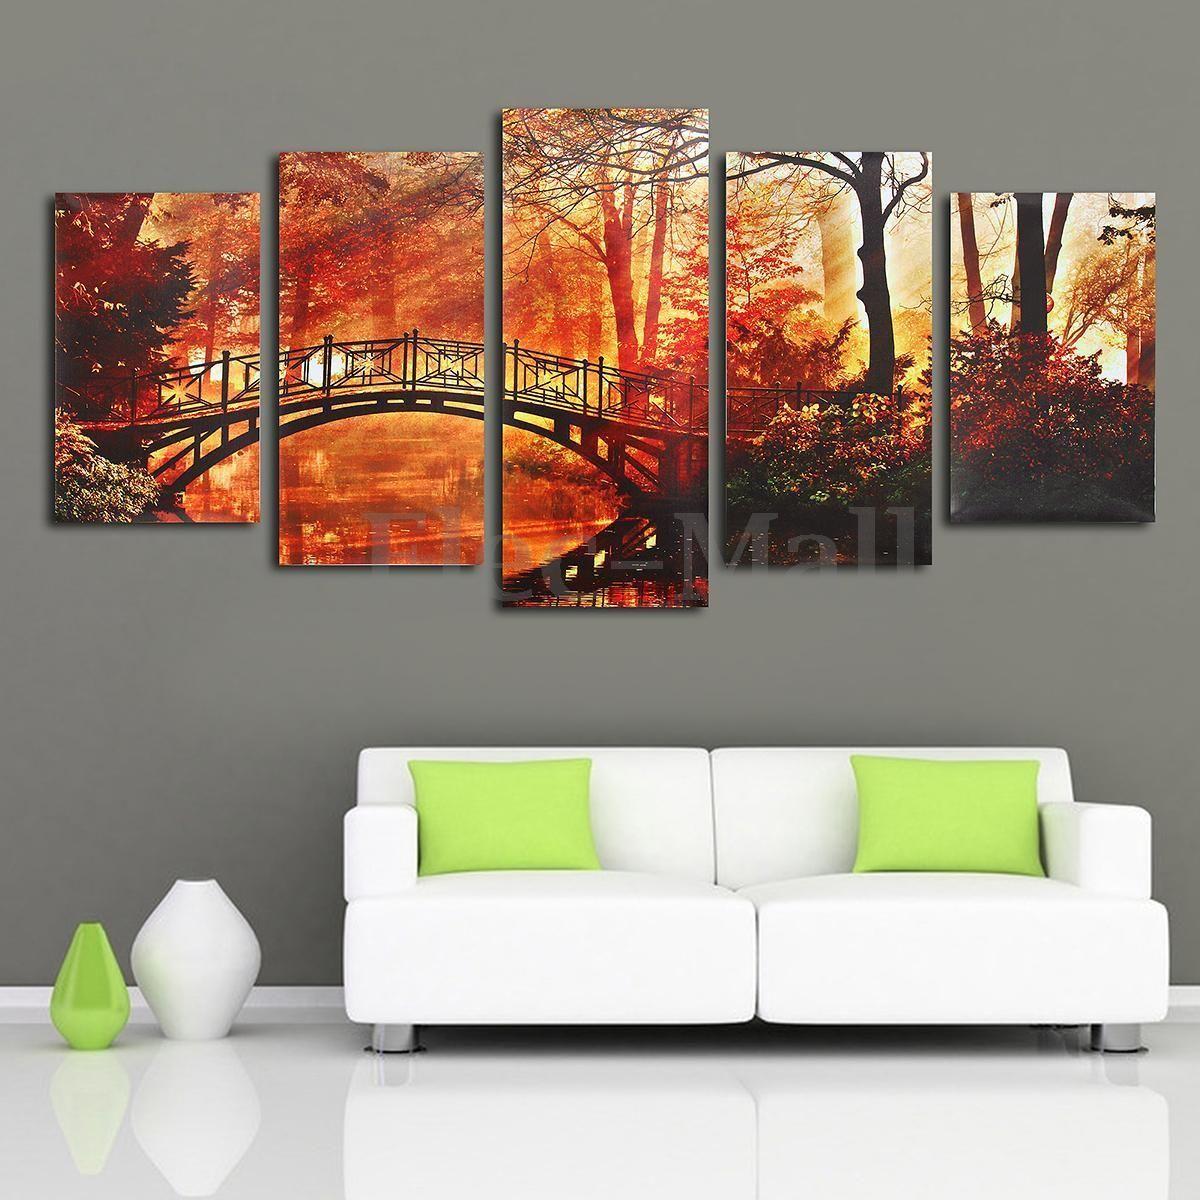 5PCS Modern Art Print Painting Maple Bridge Wall Home Decor On ...